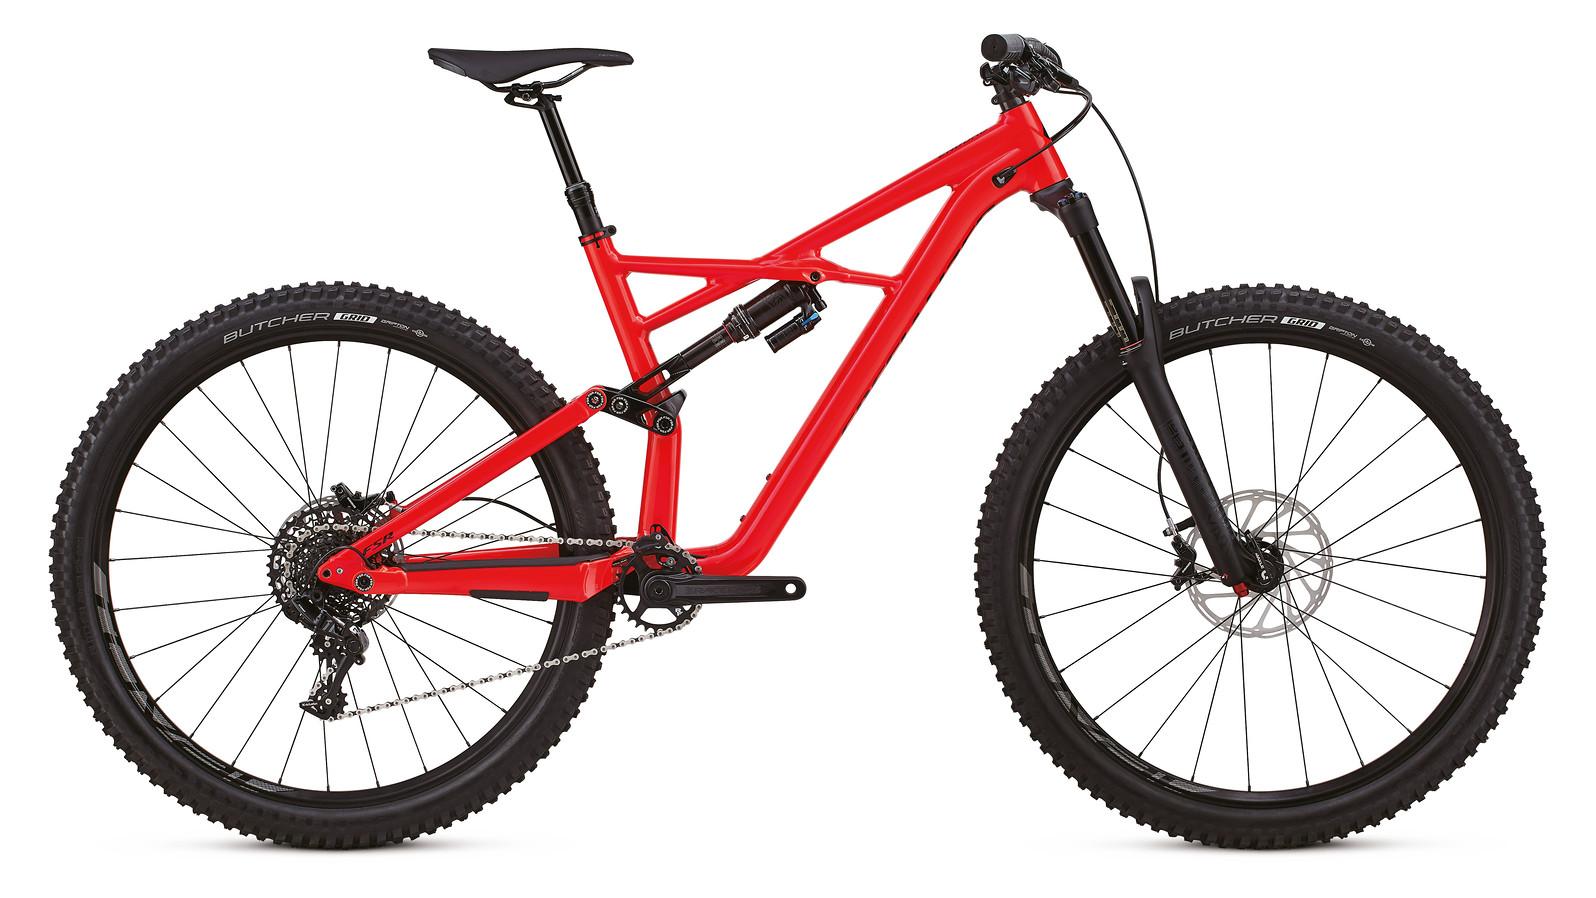 2018 Specialized Enduro Comp 29/6Fattie Bike - Reviews